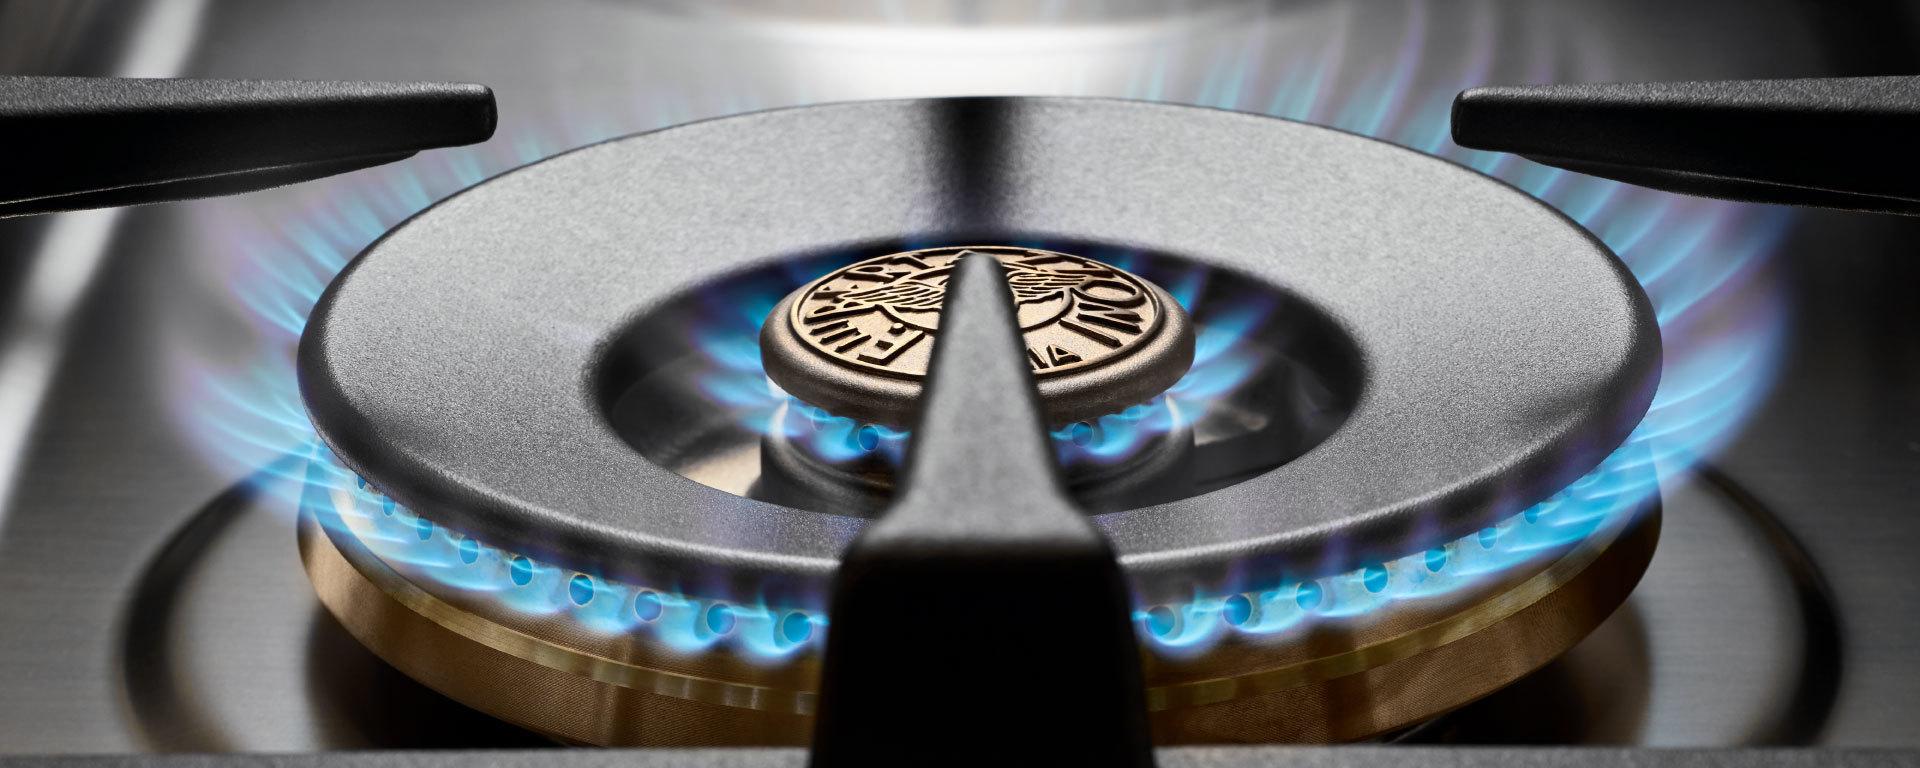 Газовая плита Bertazzoni MAS1006MFEDVIT